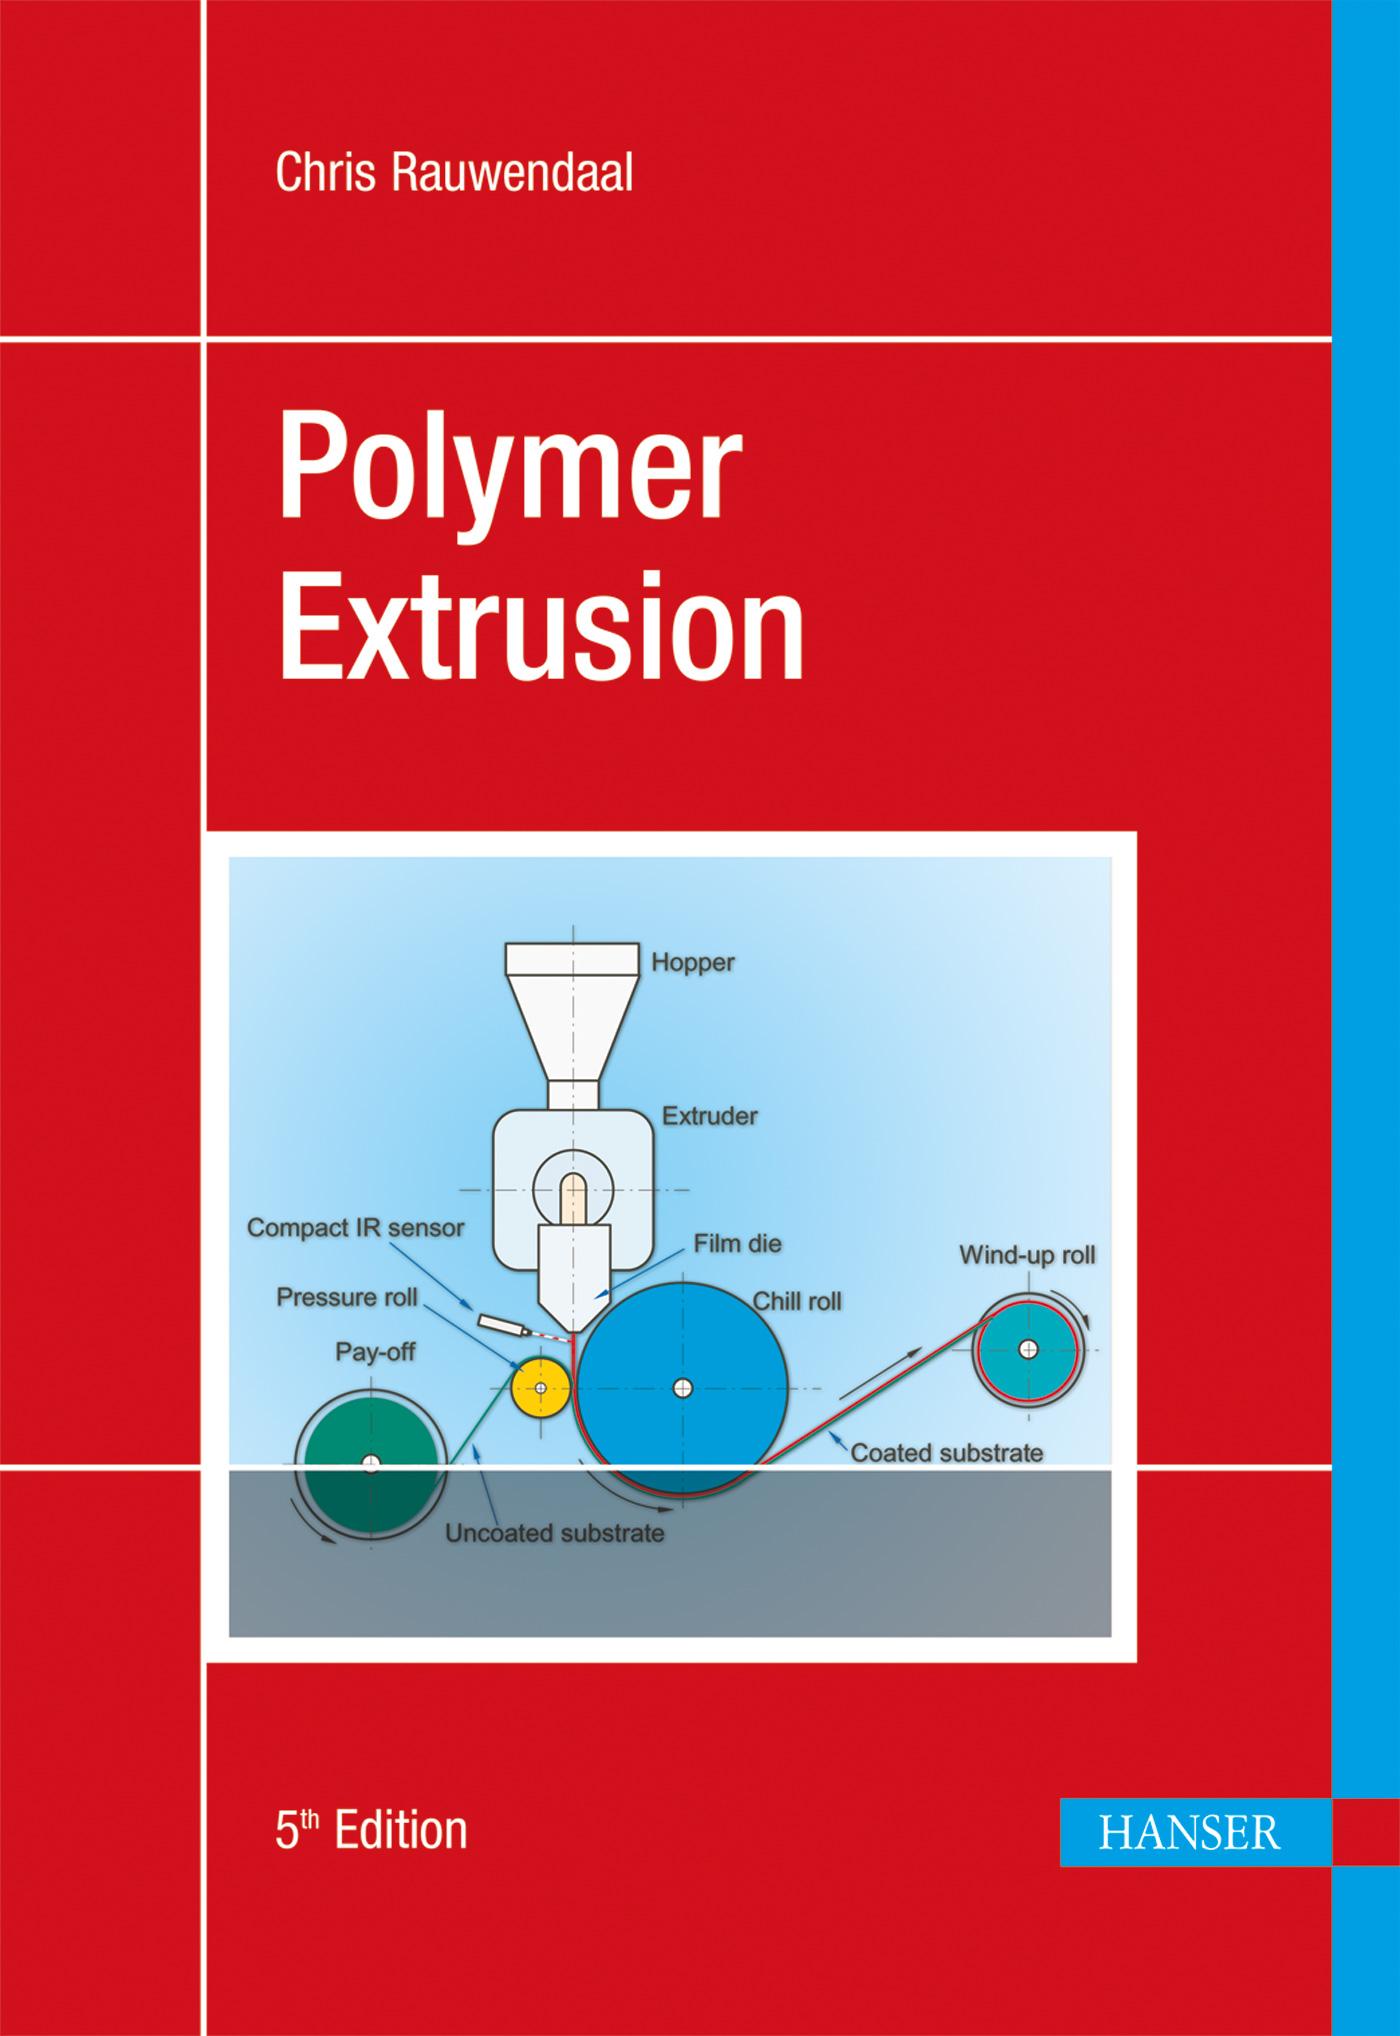 Rauwendaal, Polymer Extrusion, 978-1-56990-516-6